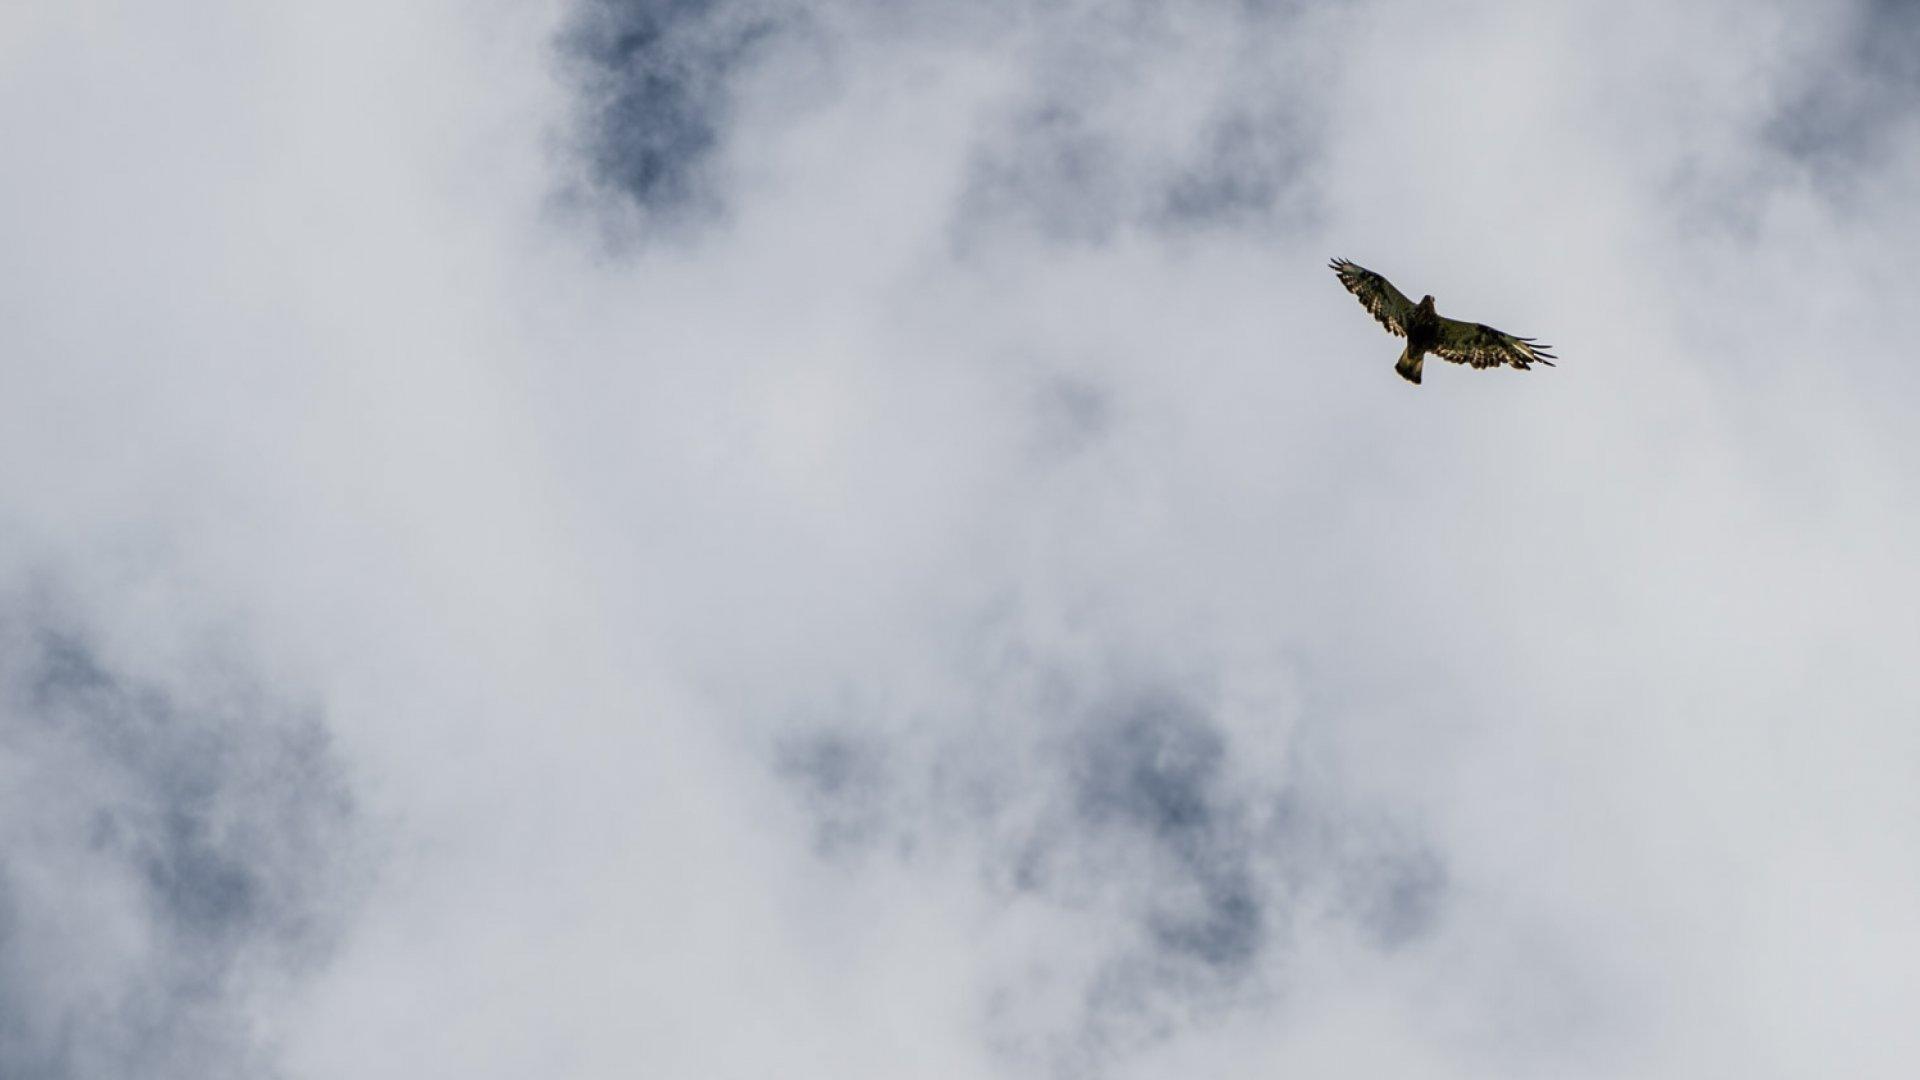 fågel, bird, natur, himmel, 1920 x 842, ted logart